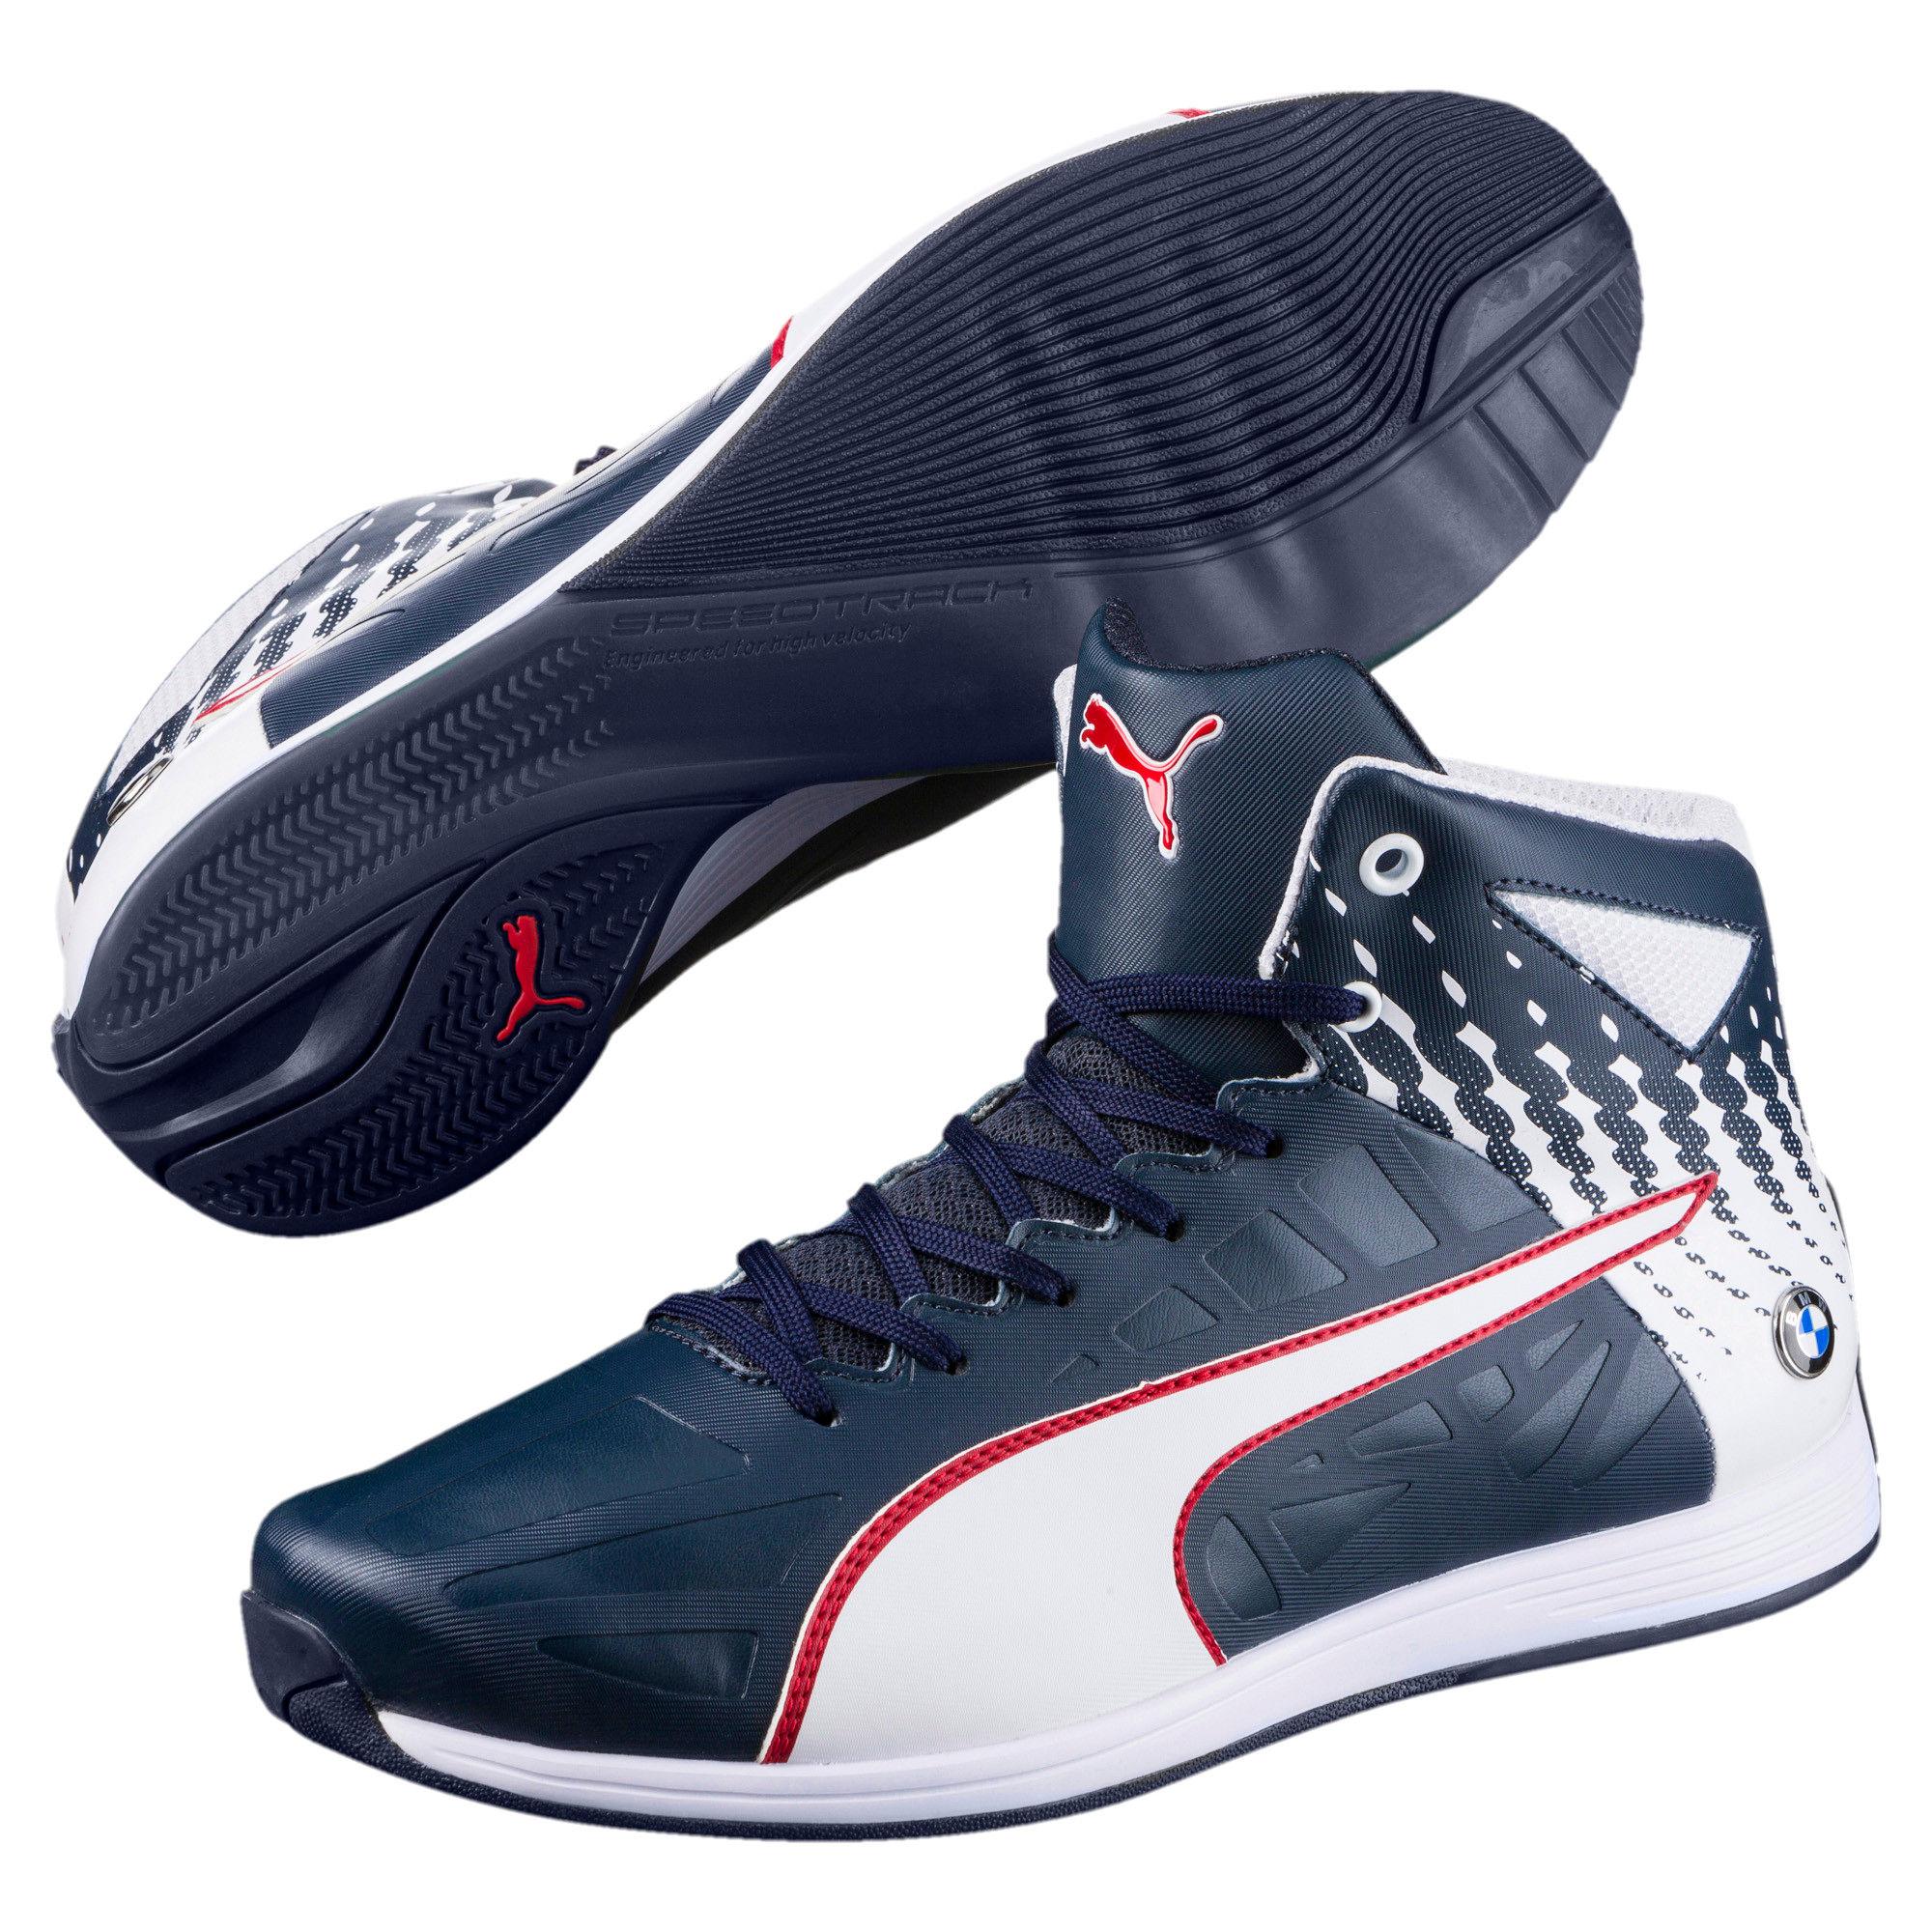 Puma Bmw Ms Evospeed Mid Sneaker: Buy